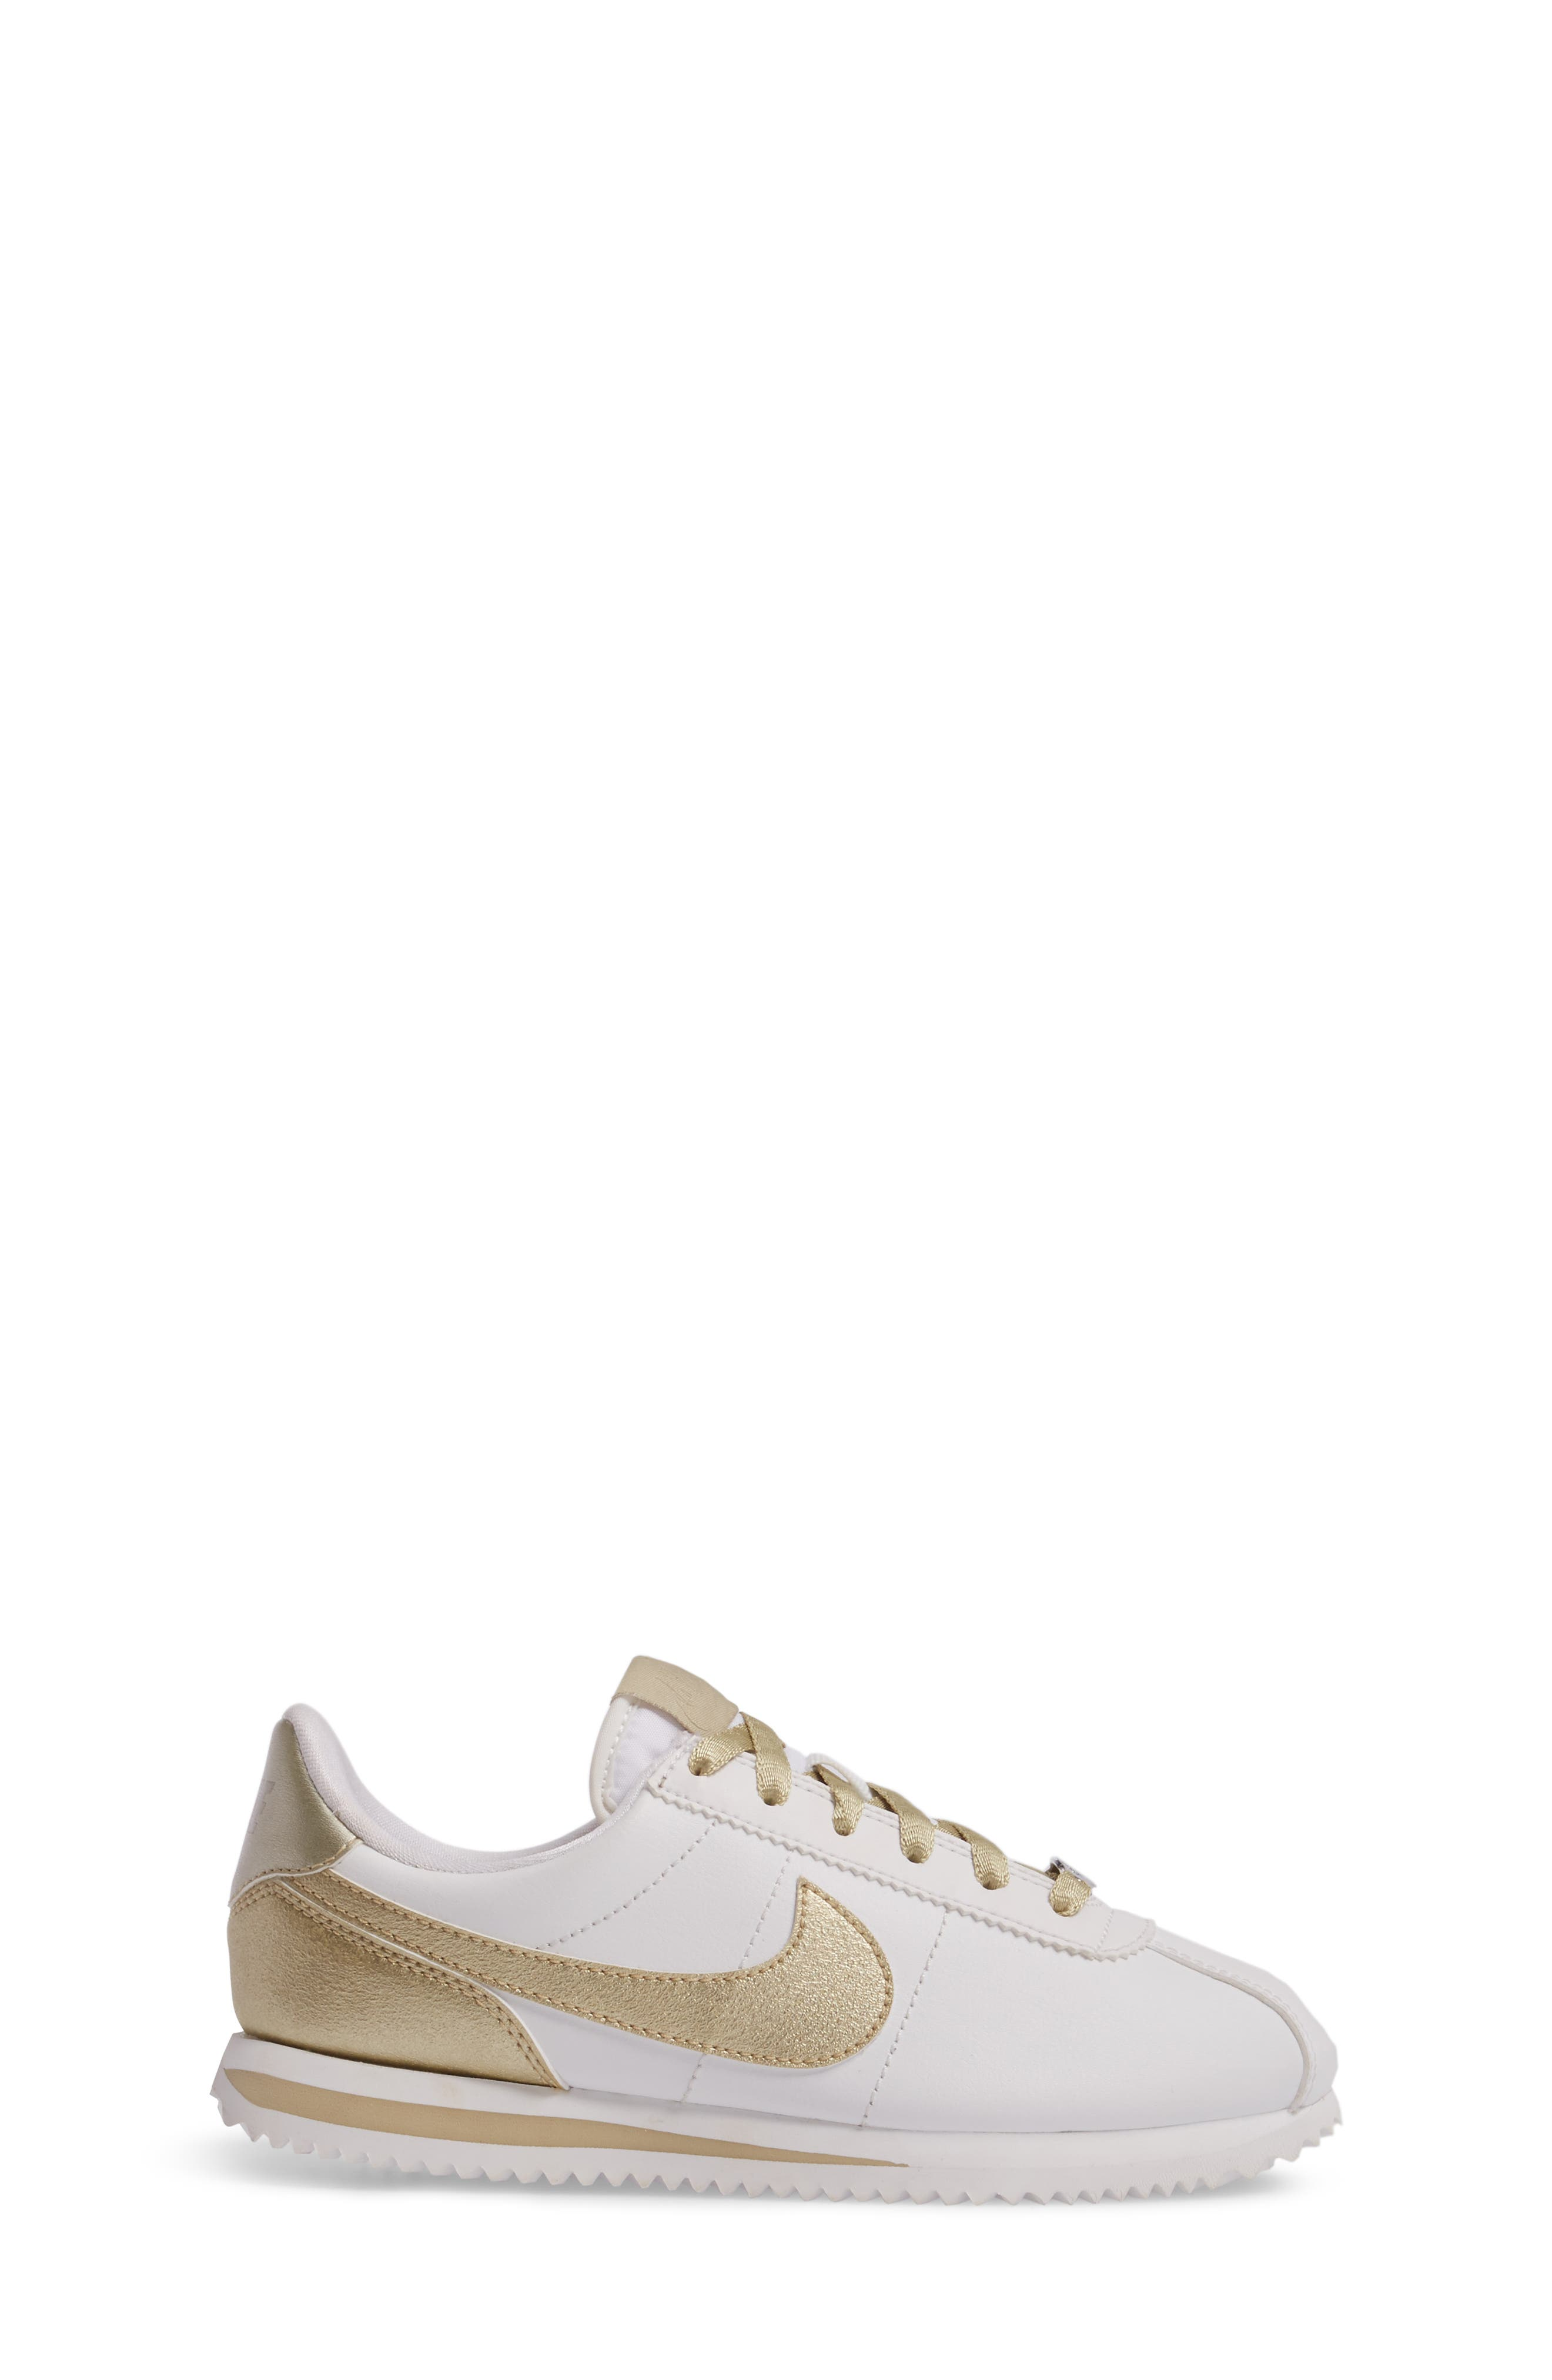 Cortez Basic SE Sneaker,                             Alternate thumbnail 3, color,                             101